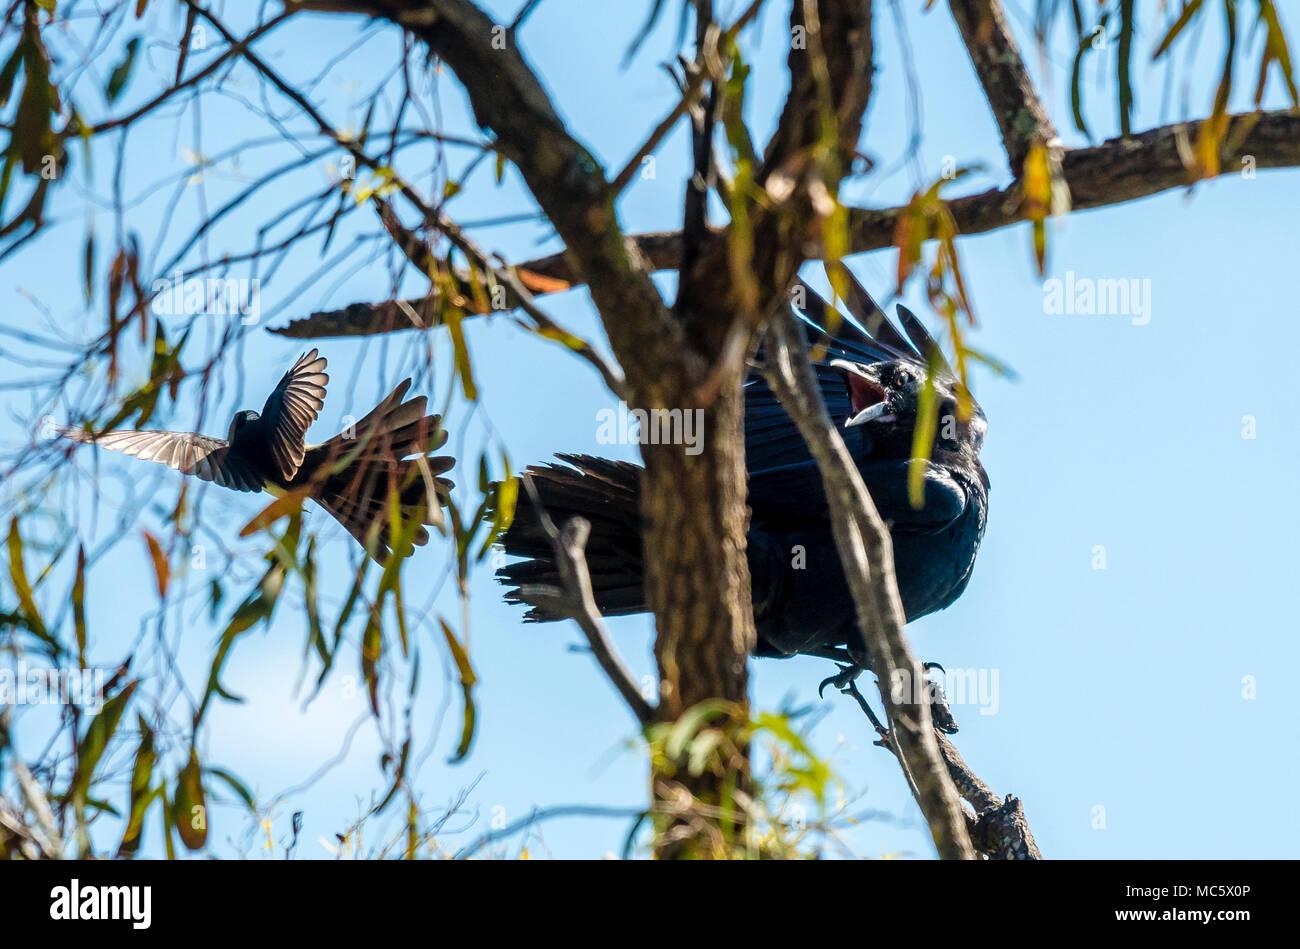 Australian Raven, Corvus coronoides - Stock Image